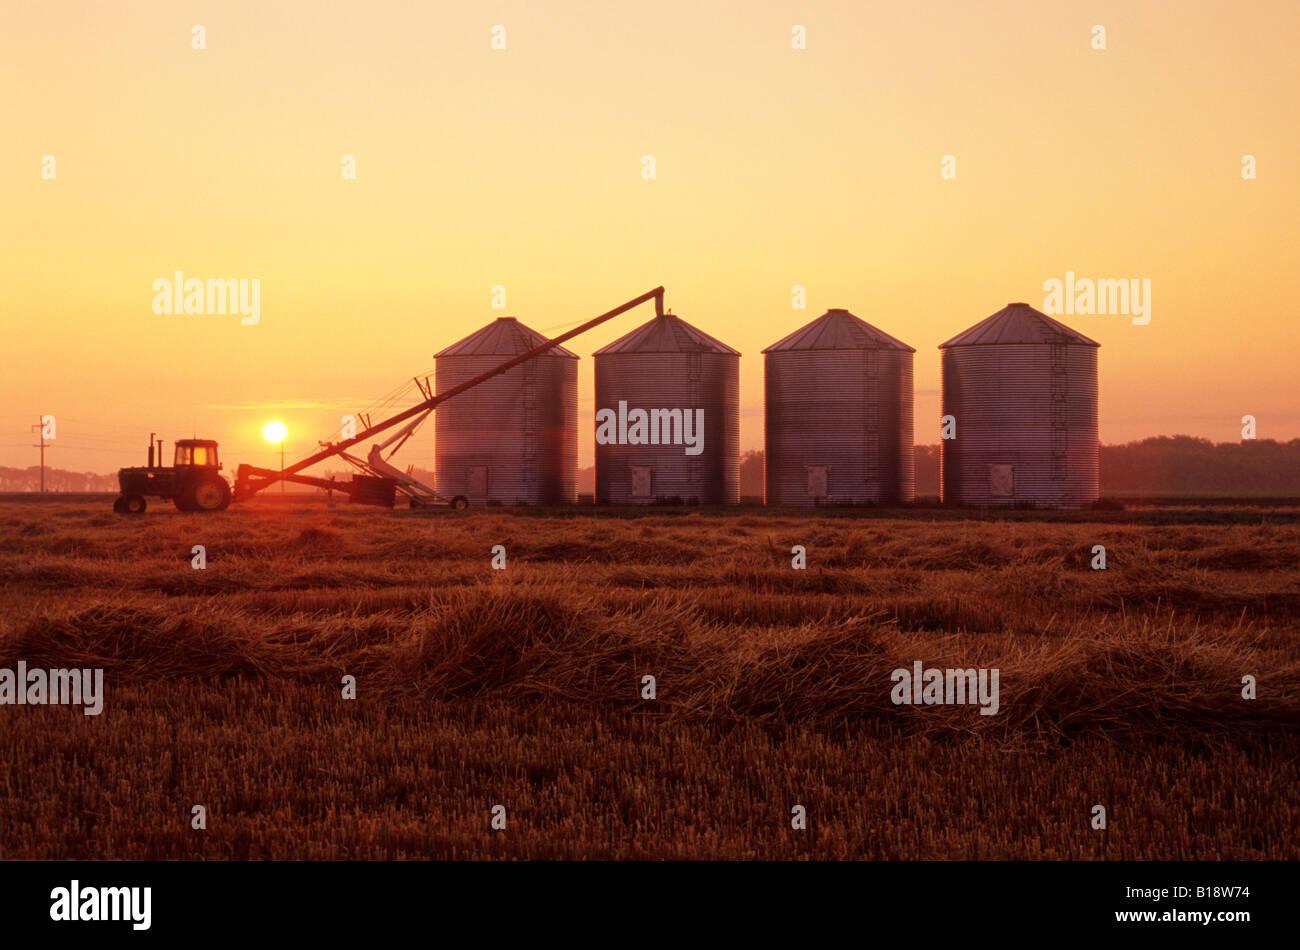 Filling Crop storage bins with winter wheat, Carey, Manitoba, Canada. - Stock Image